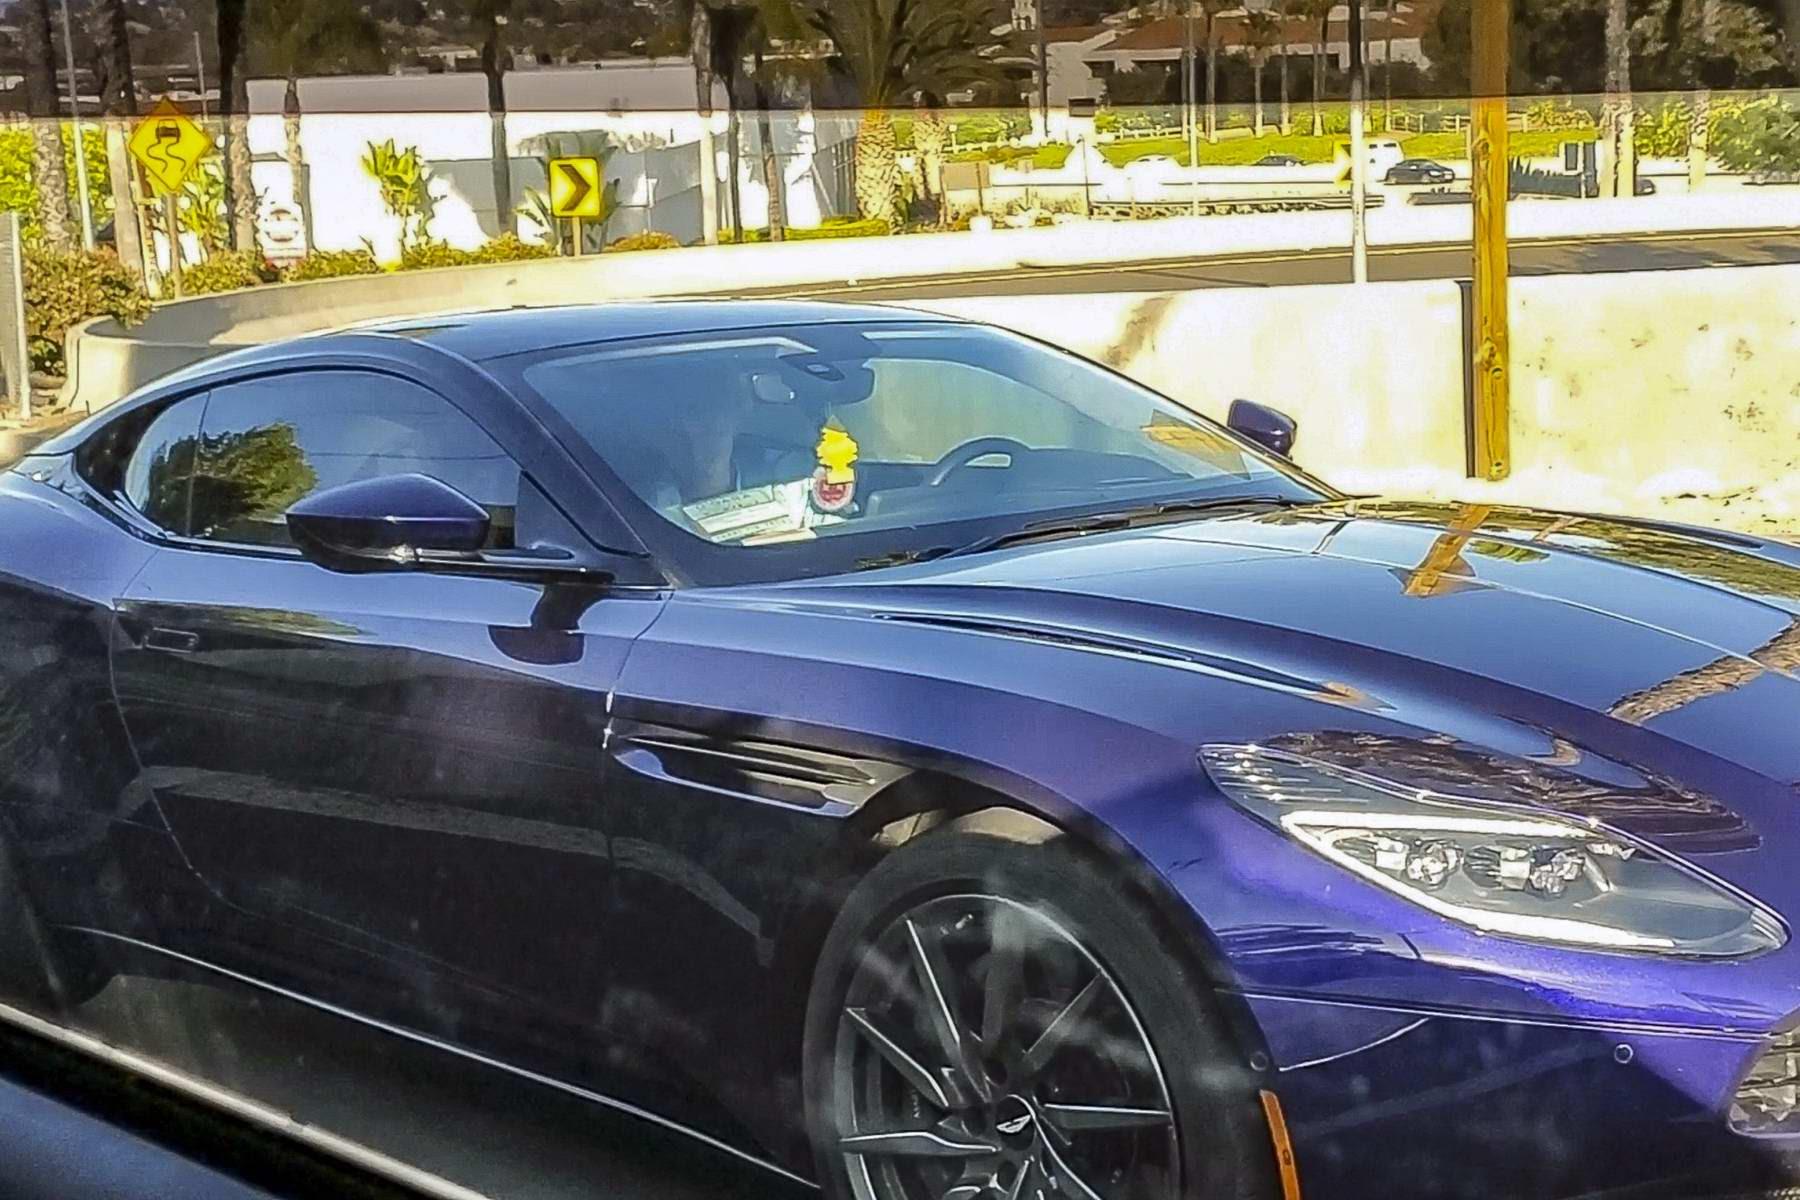 Megan Fox And Machine Gun Kelly Enjoy Drive In An Aston Martin After A Coffee Date In Calabasas California 160520 5